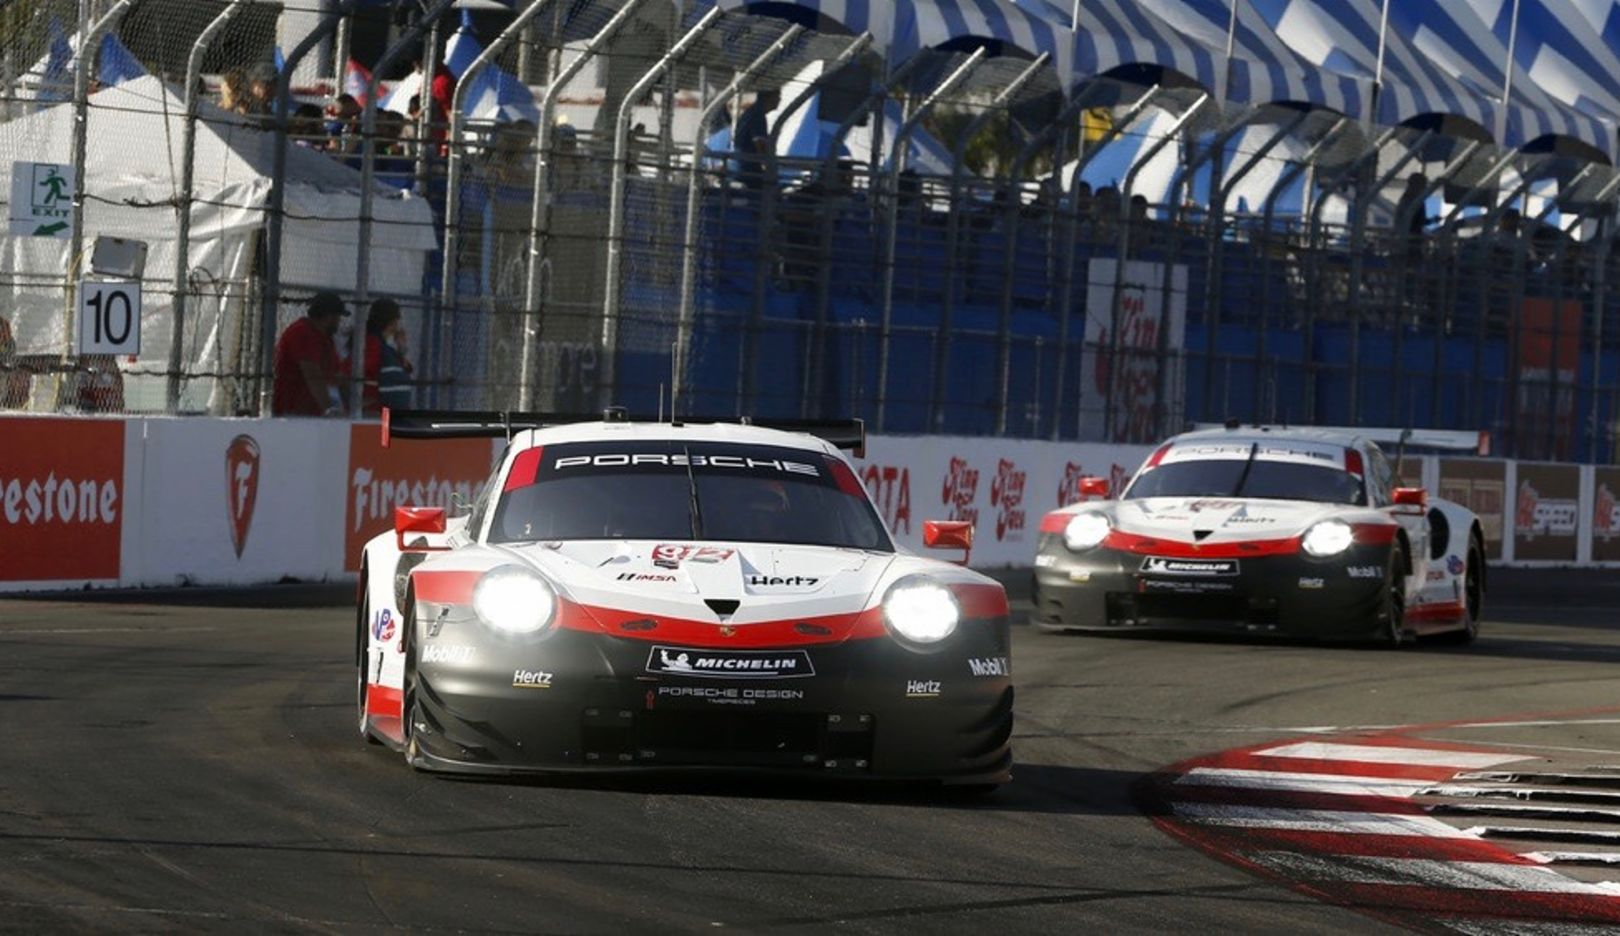 911 RSR, чемпионат IMSA WeatherTech SportsCar Championship, Лонг-Бич, 2018, Porsche AG